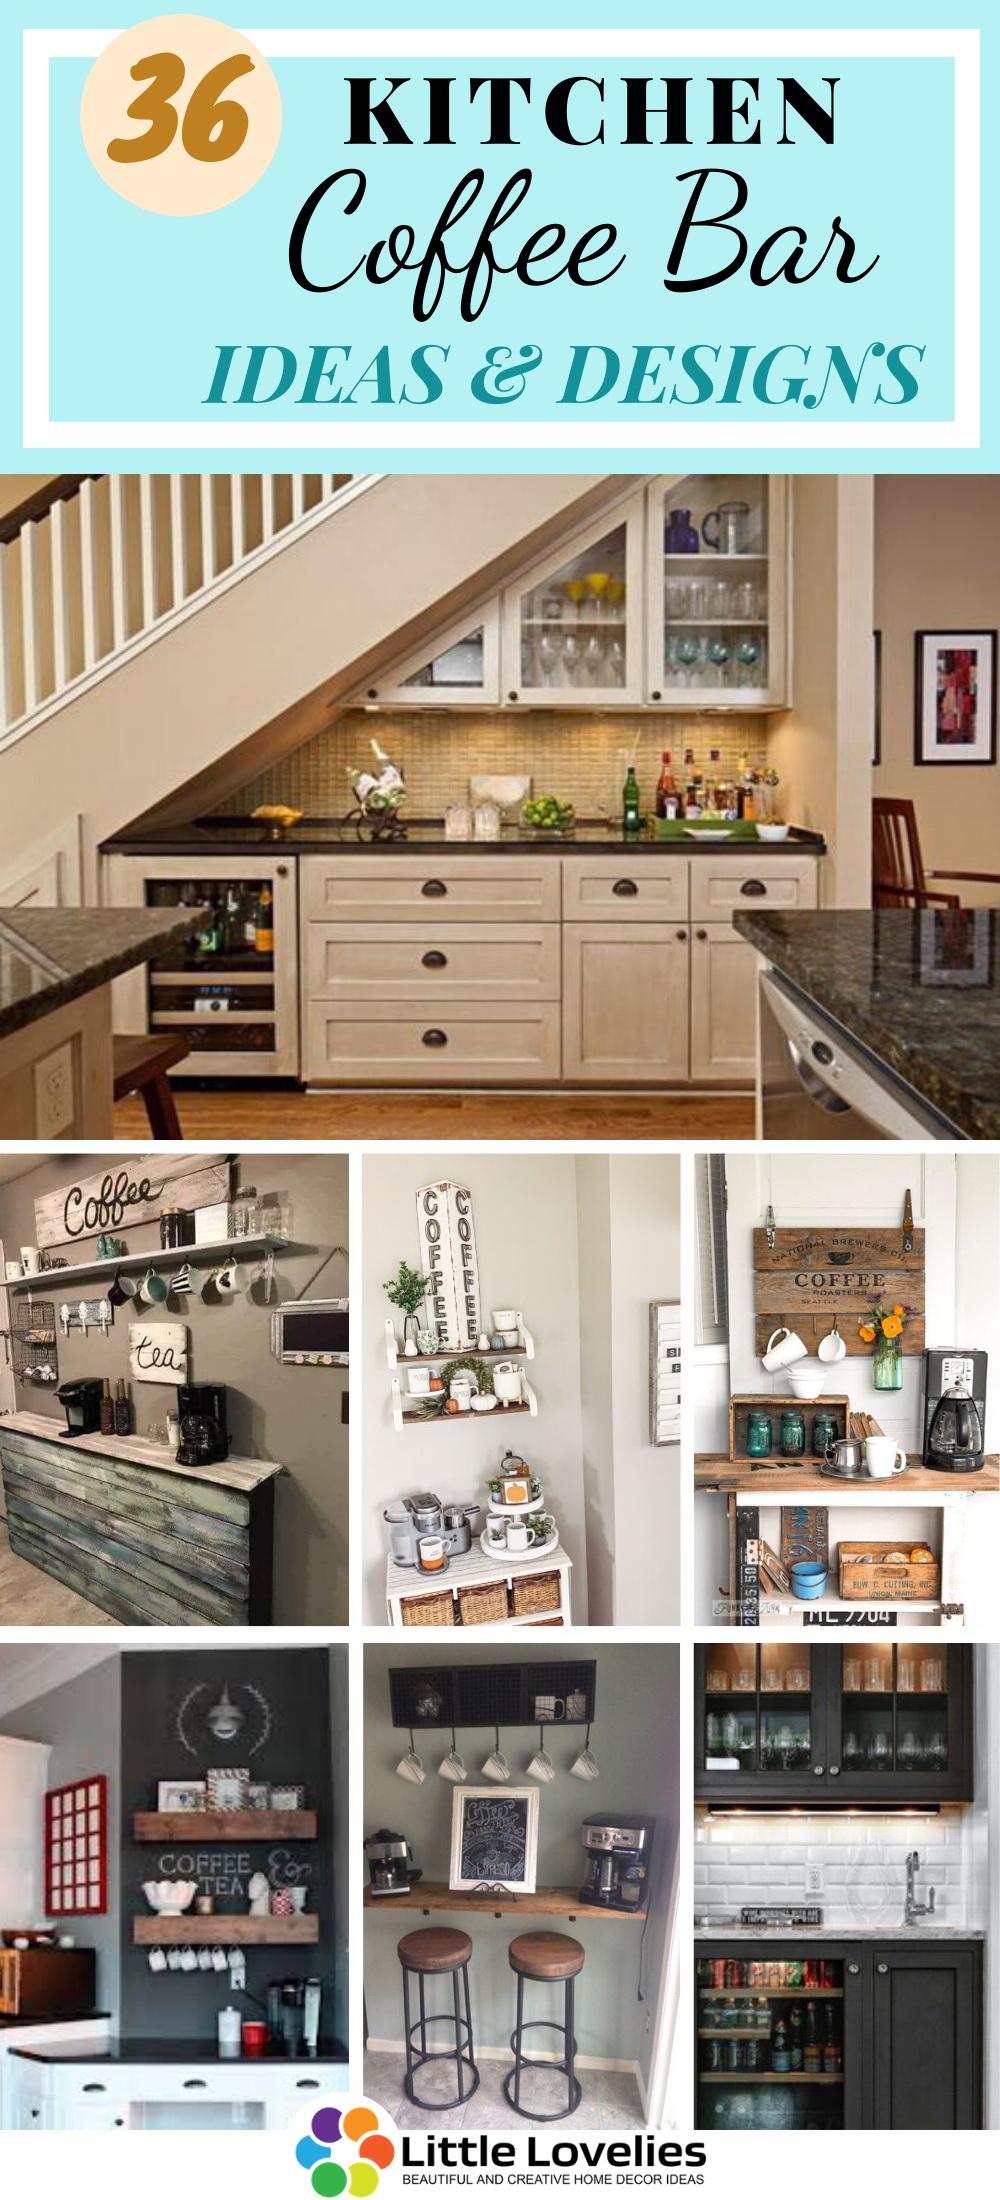 36 Kitchen Coffee Bar Ideas To Organize At Your Home Kitchen Bar